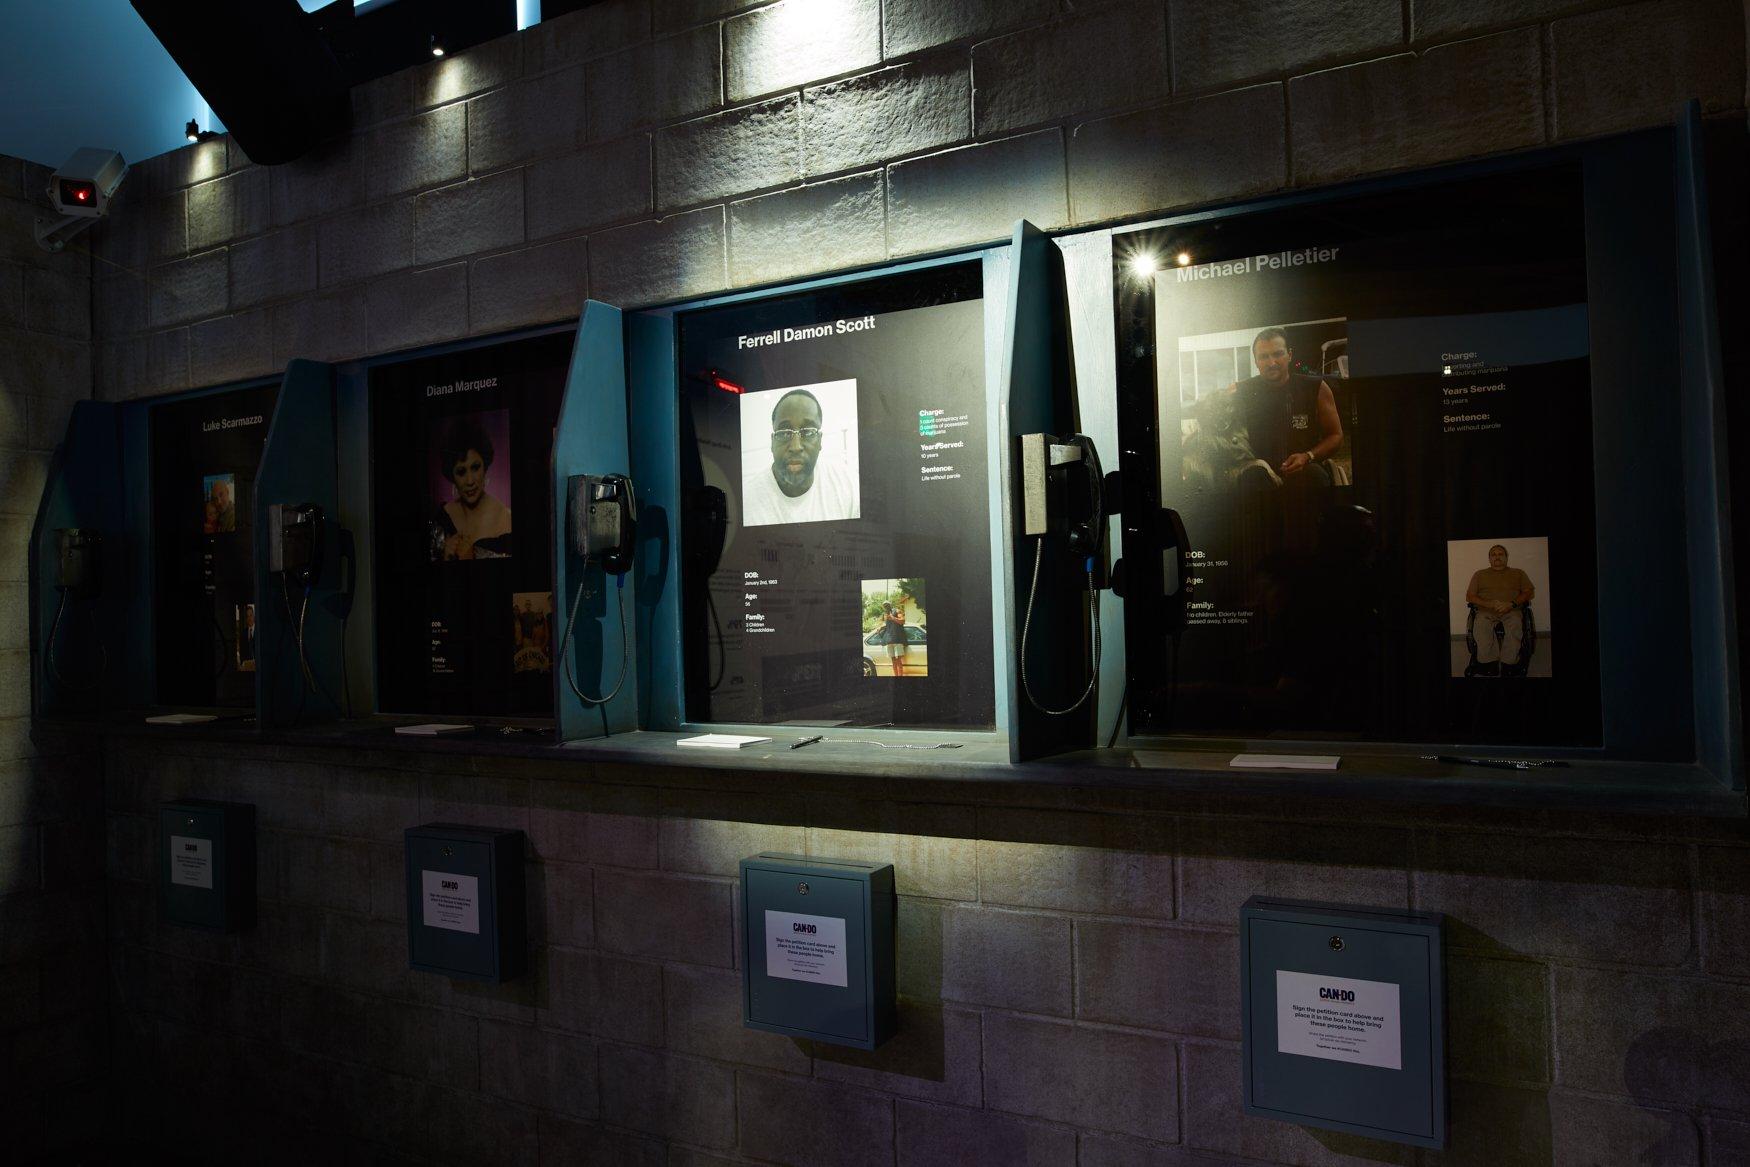 Weedmaps: Weedmaps Museum of Weed - Advocacy